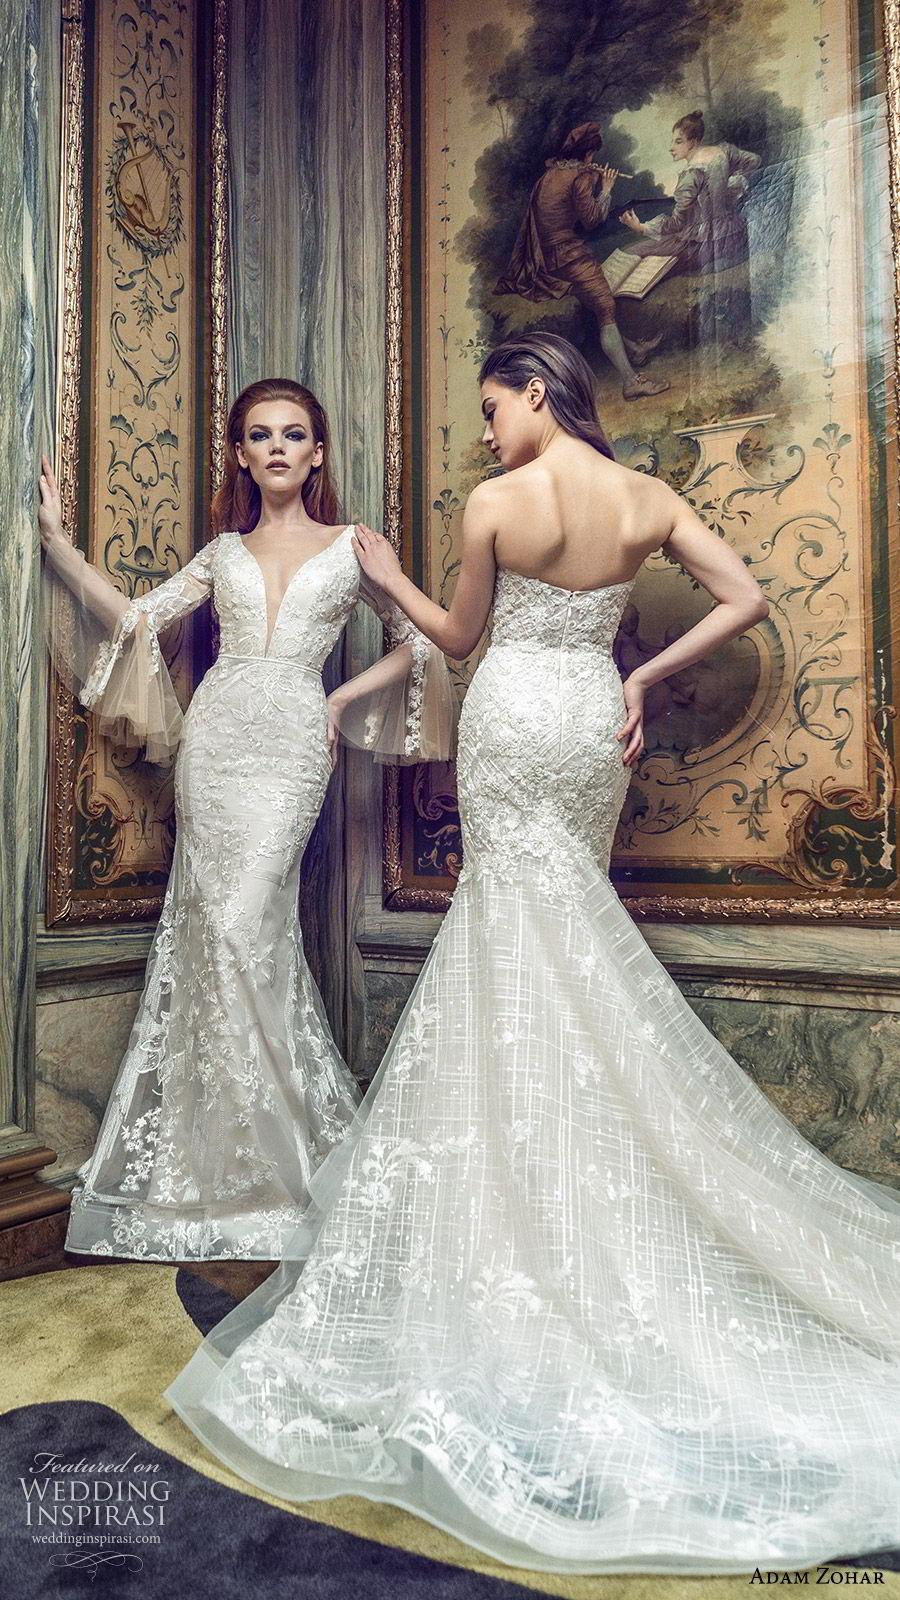 adam zohar 2020 bridal long bell sleeves deep v neckline fully embellished lace sheath mermaid wedding dress (3) boho chic romantic chapel train fv